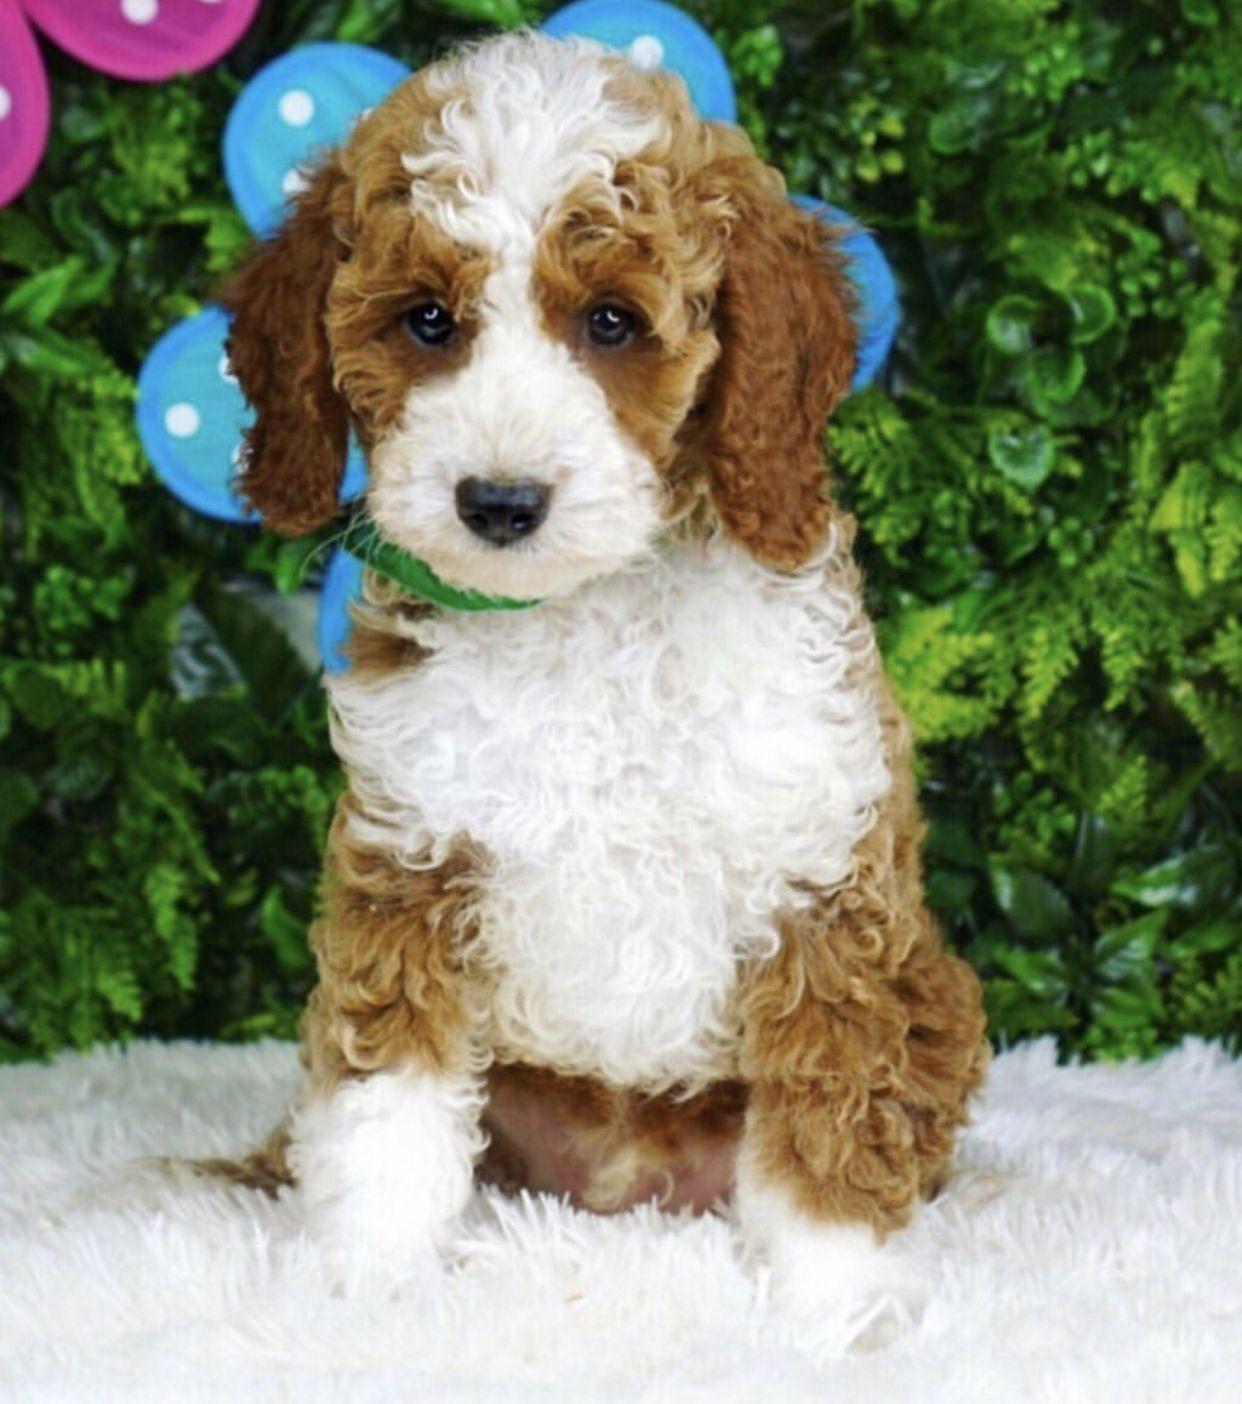 Goldendoodle Labradoodle Labradorretriever Goldenretriever Puppies Puppy Teddybeardog Doodlepuppy Ad In 2020 Goldendoodle Teddy Bear Dog Goldendoodle Breeders